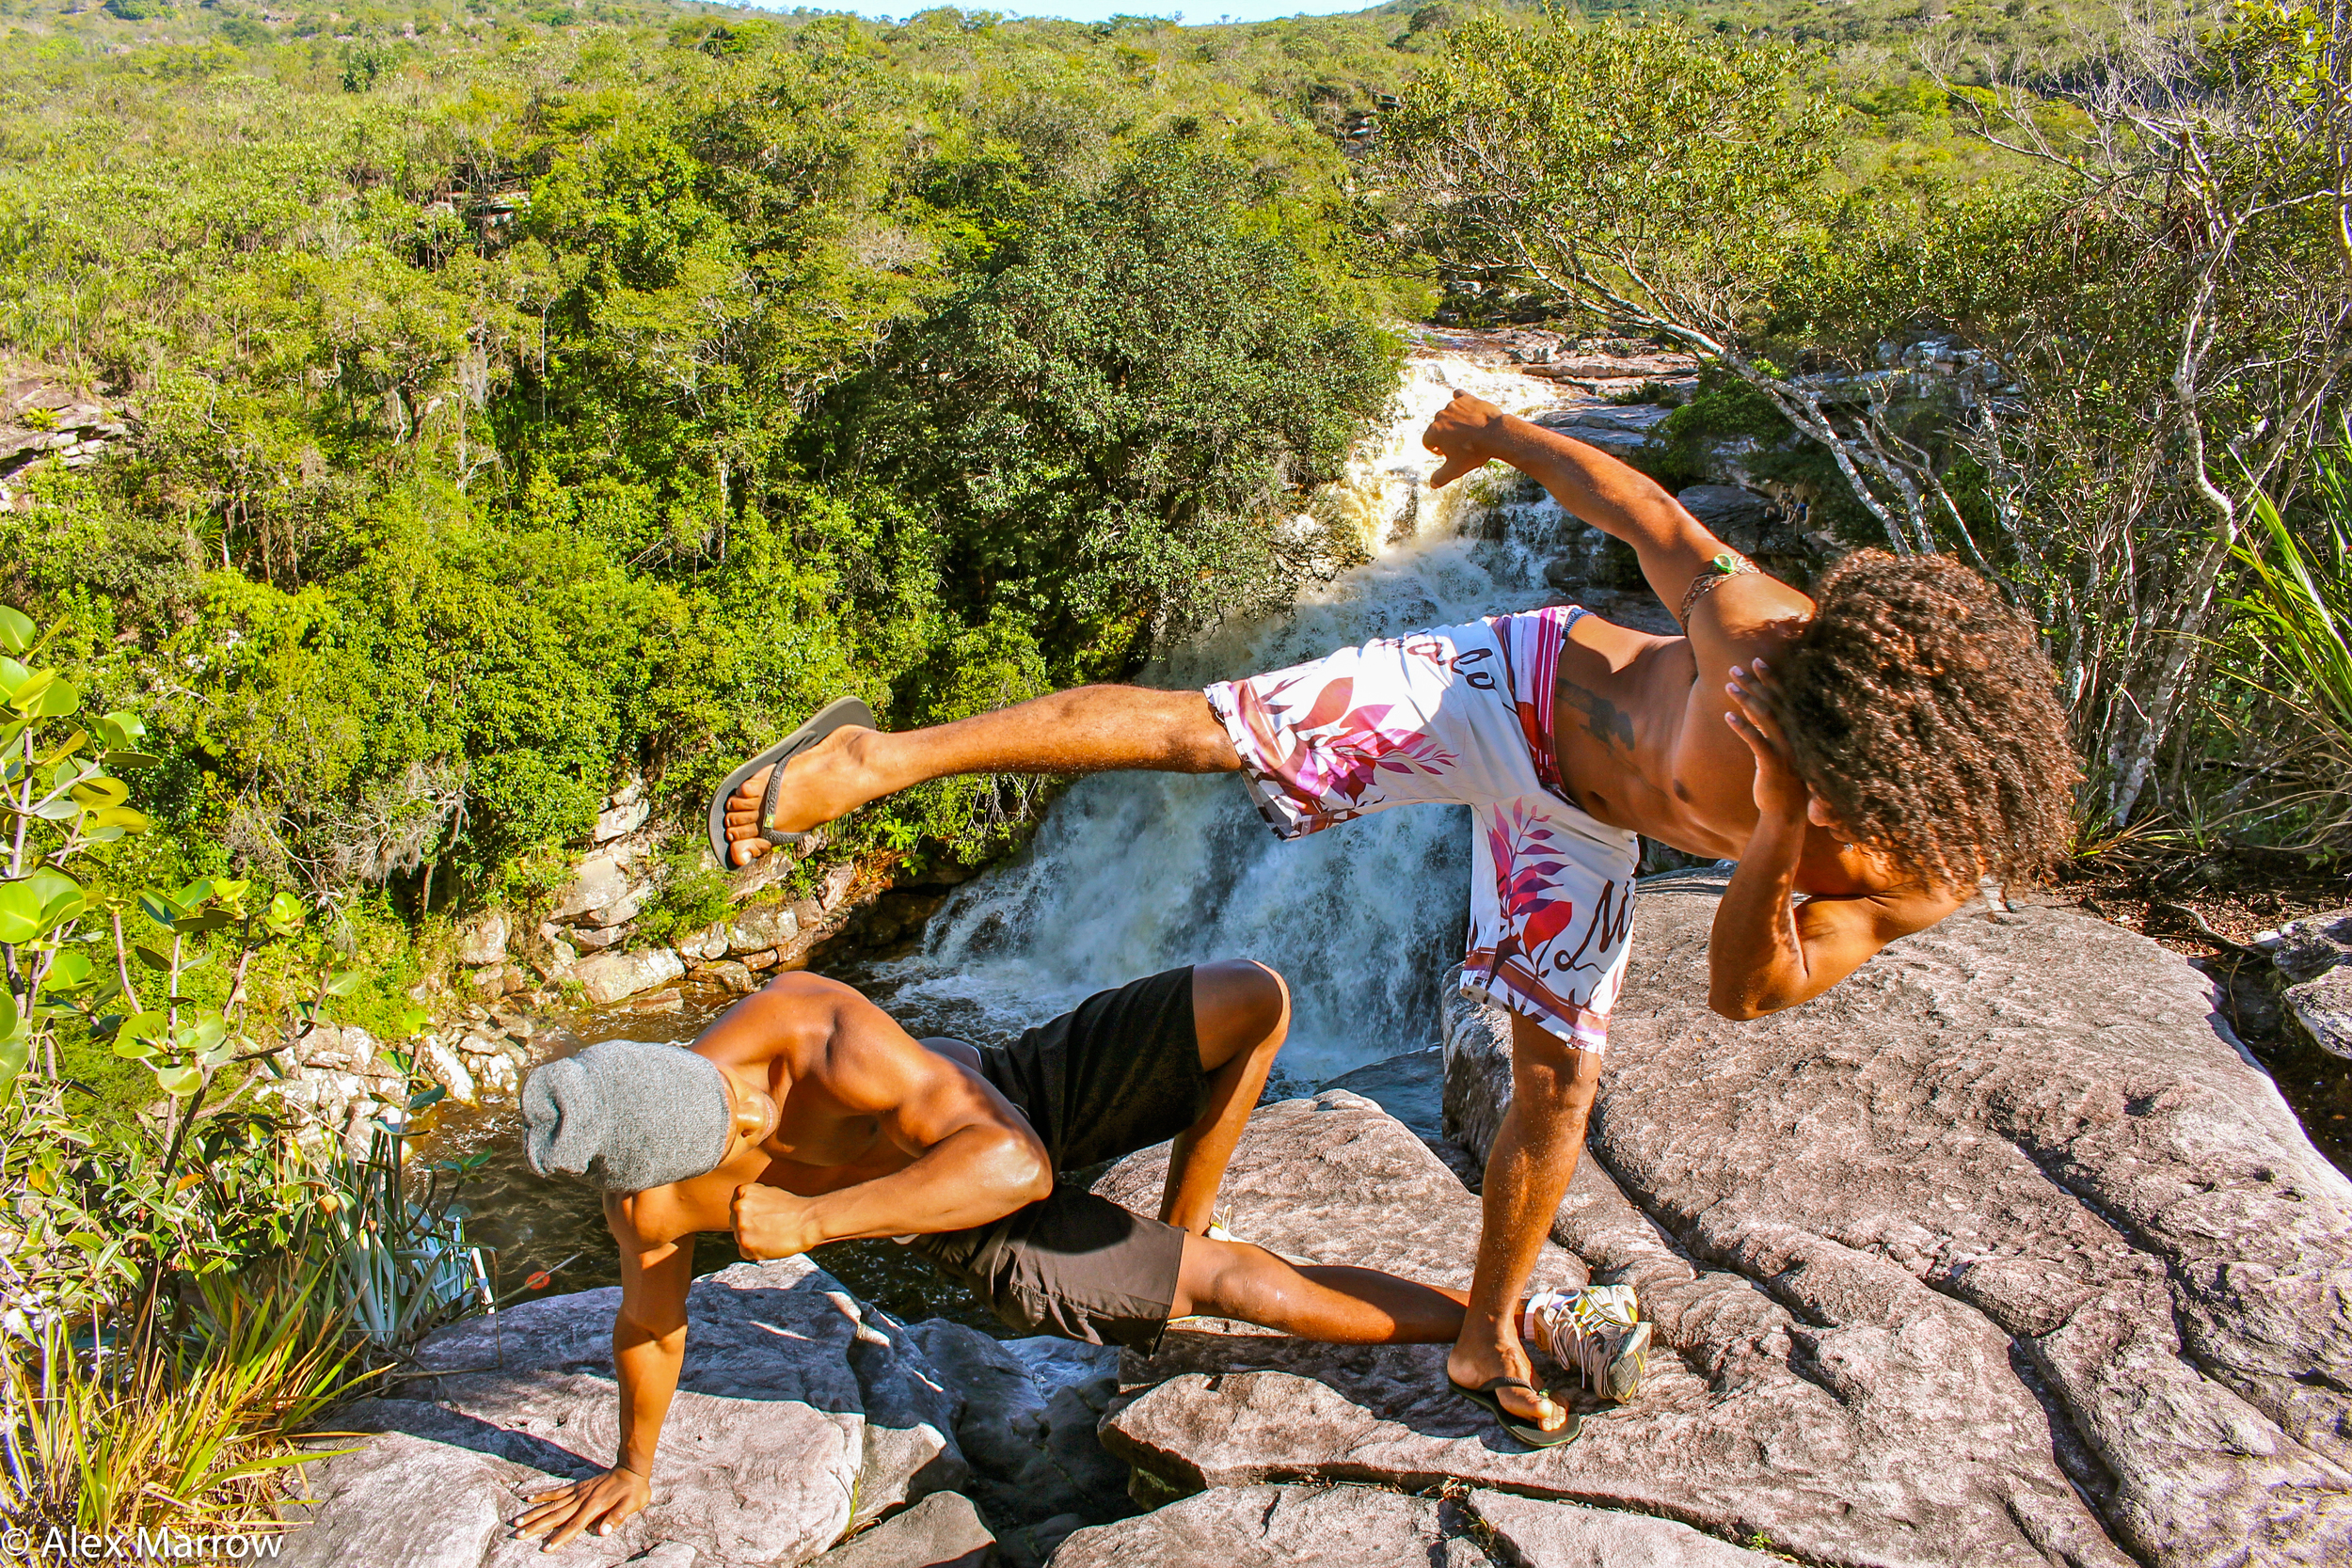 Capoeira at a Cachoeira